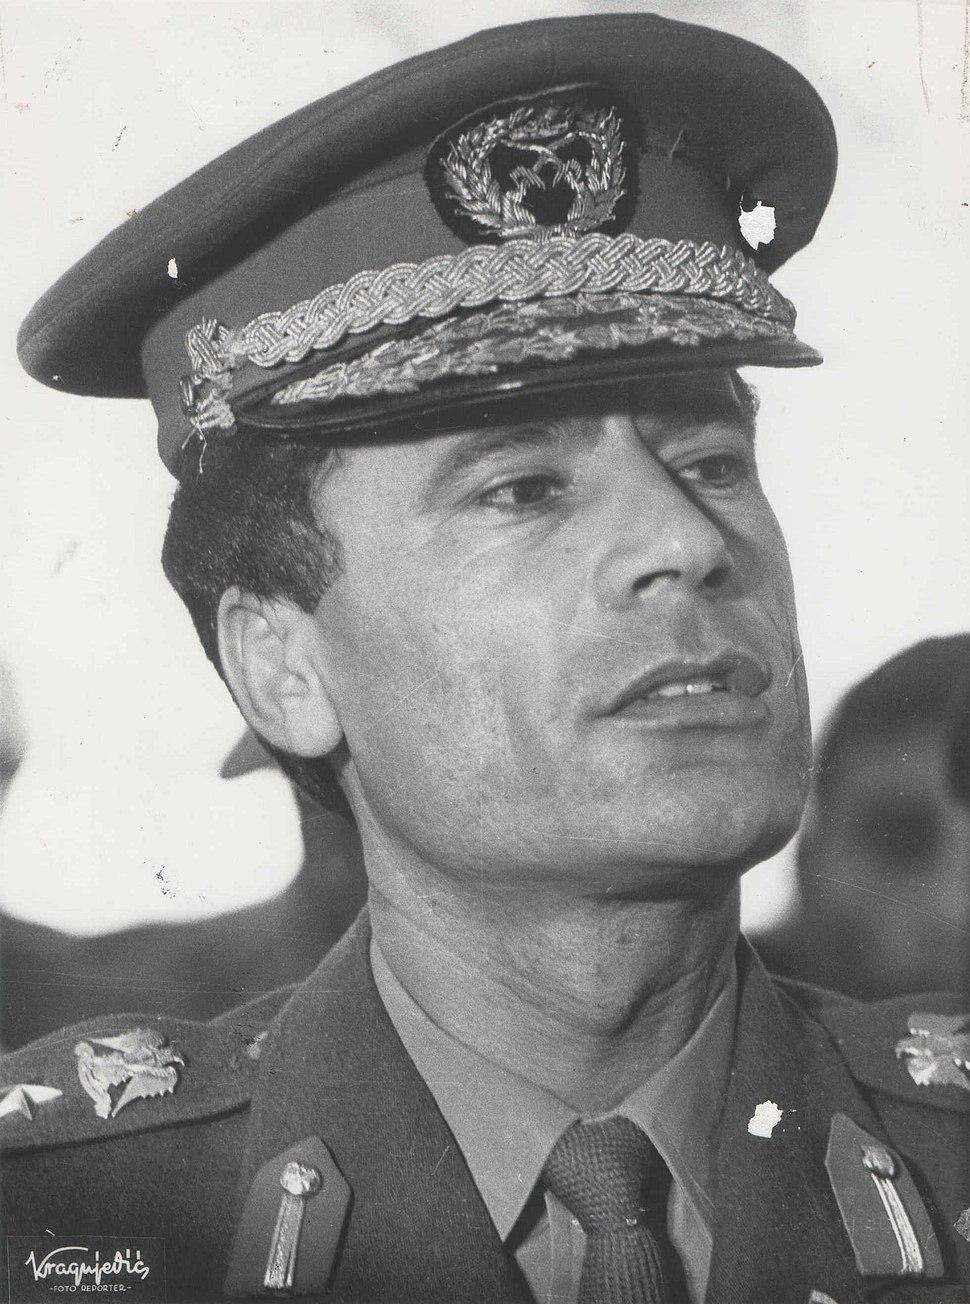 Stevan Kragujevic, Moamer el Gadafi u Beogradu